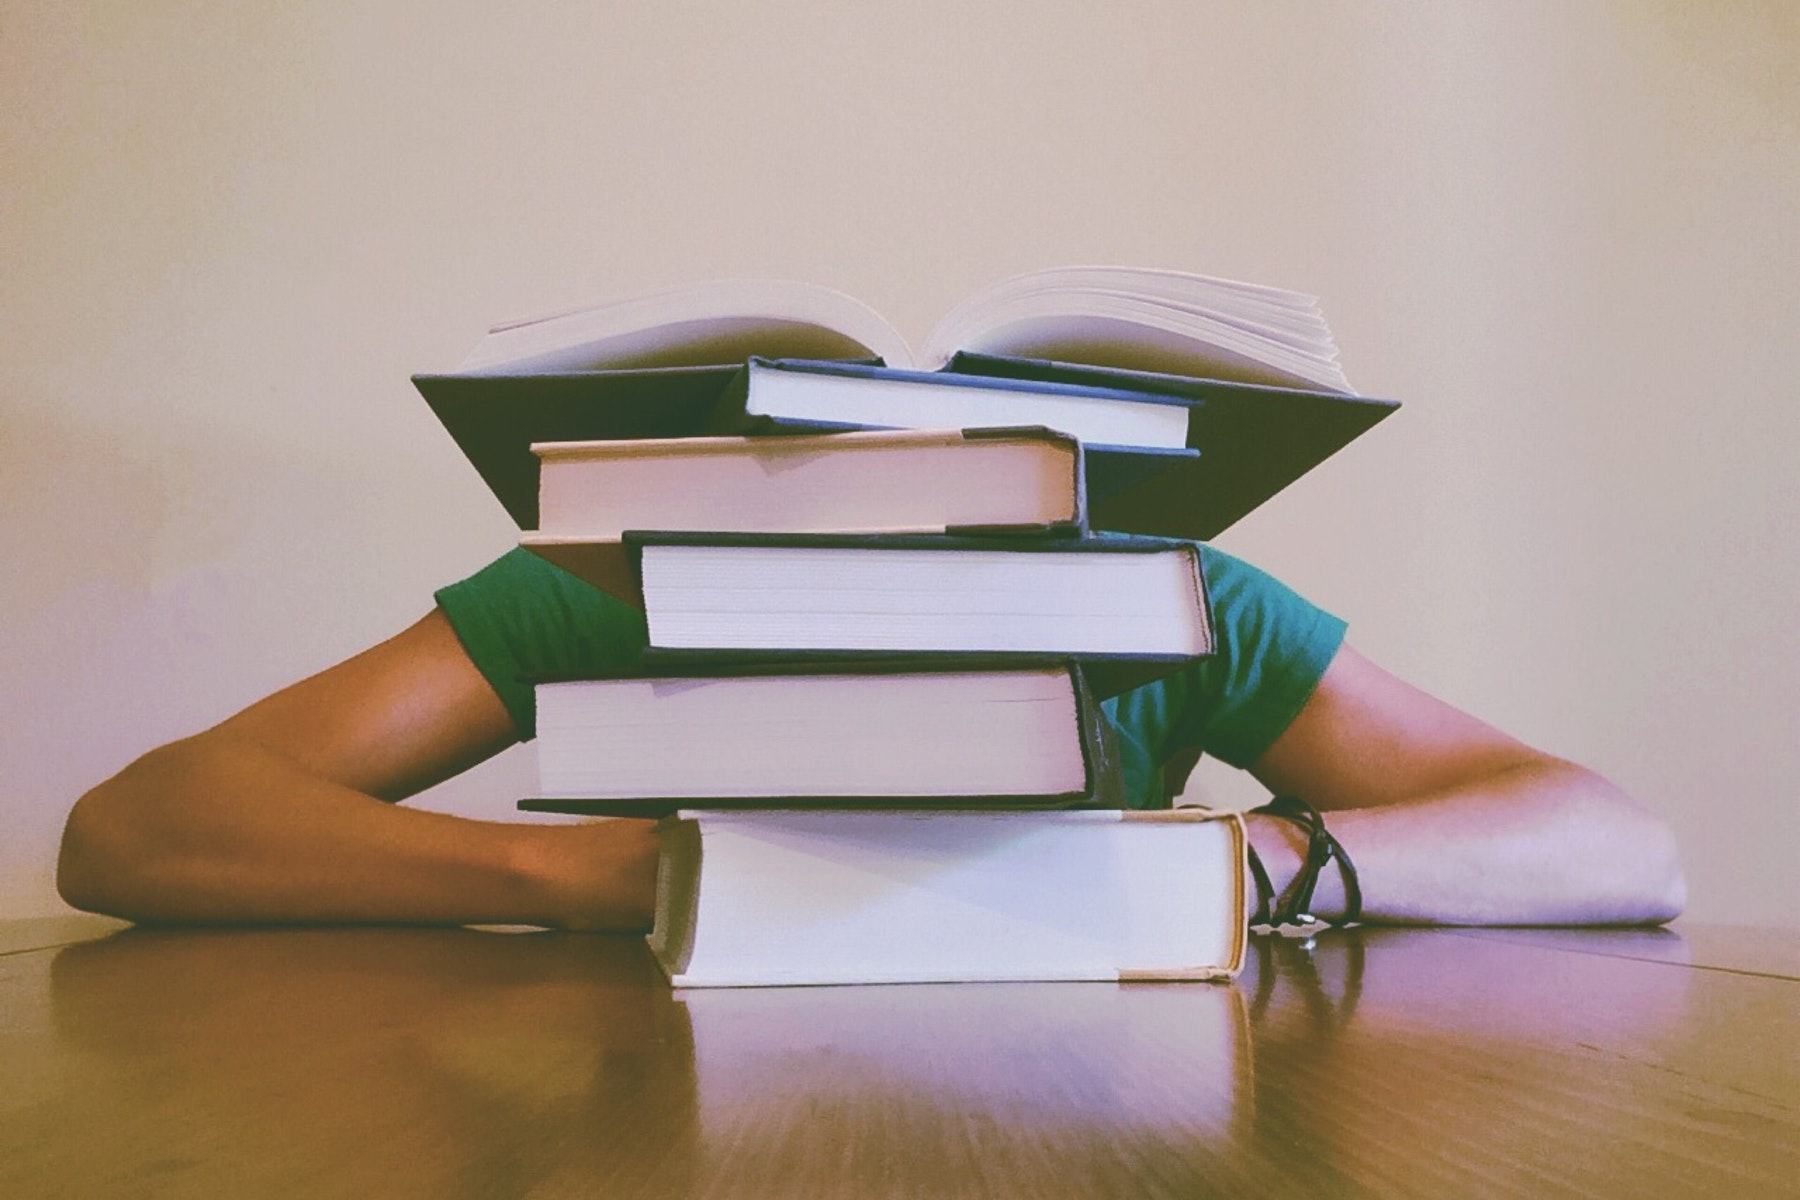 eksamen, eksamensopgave, prodoktivitet, fokus